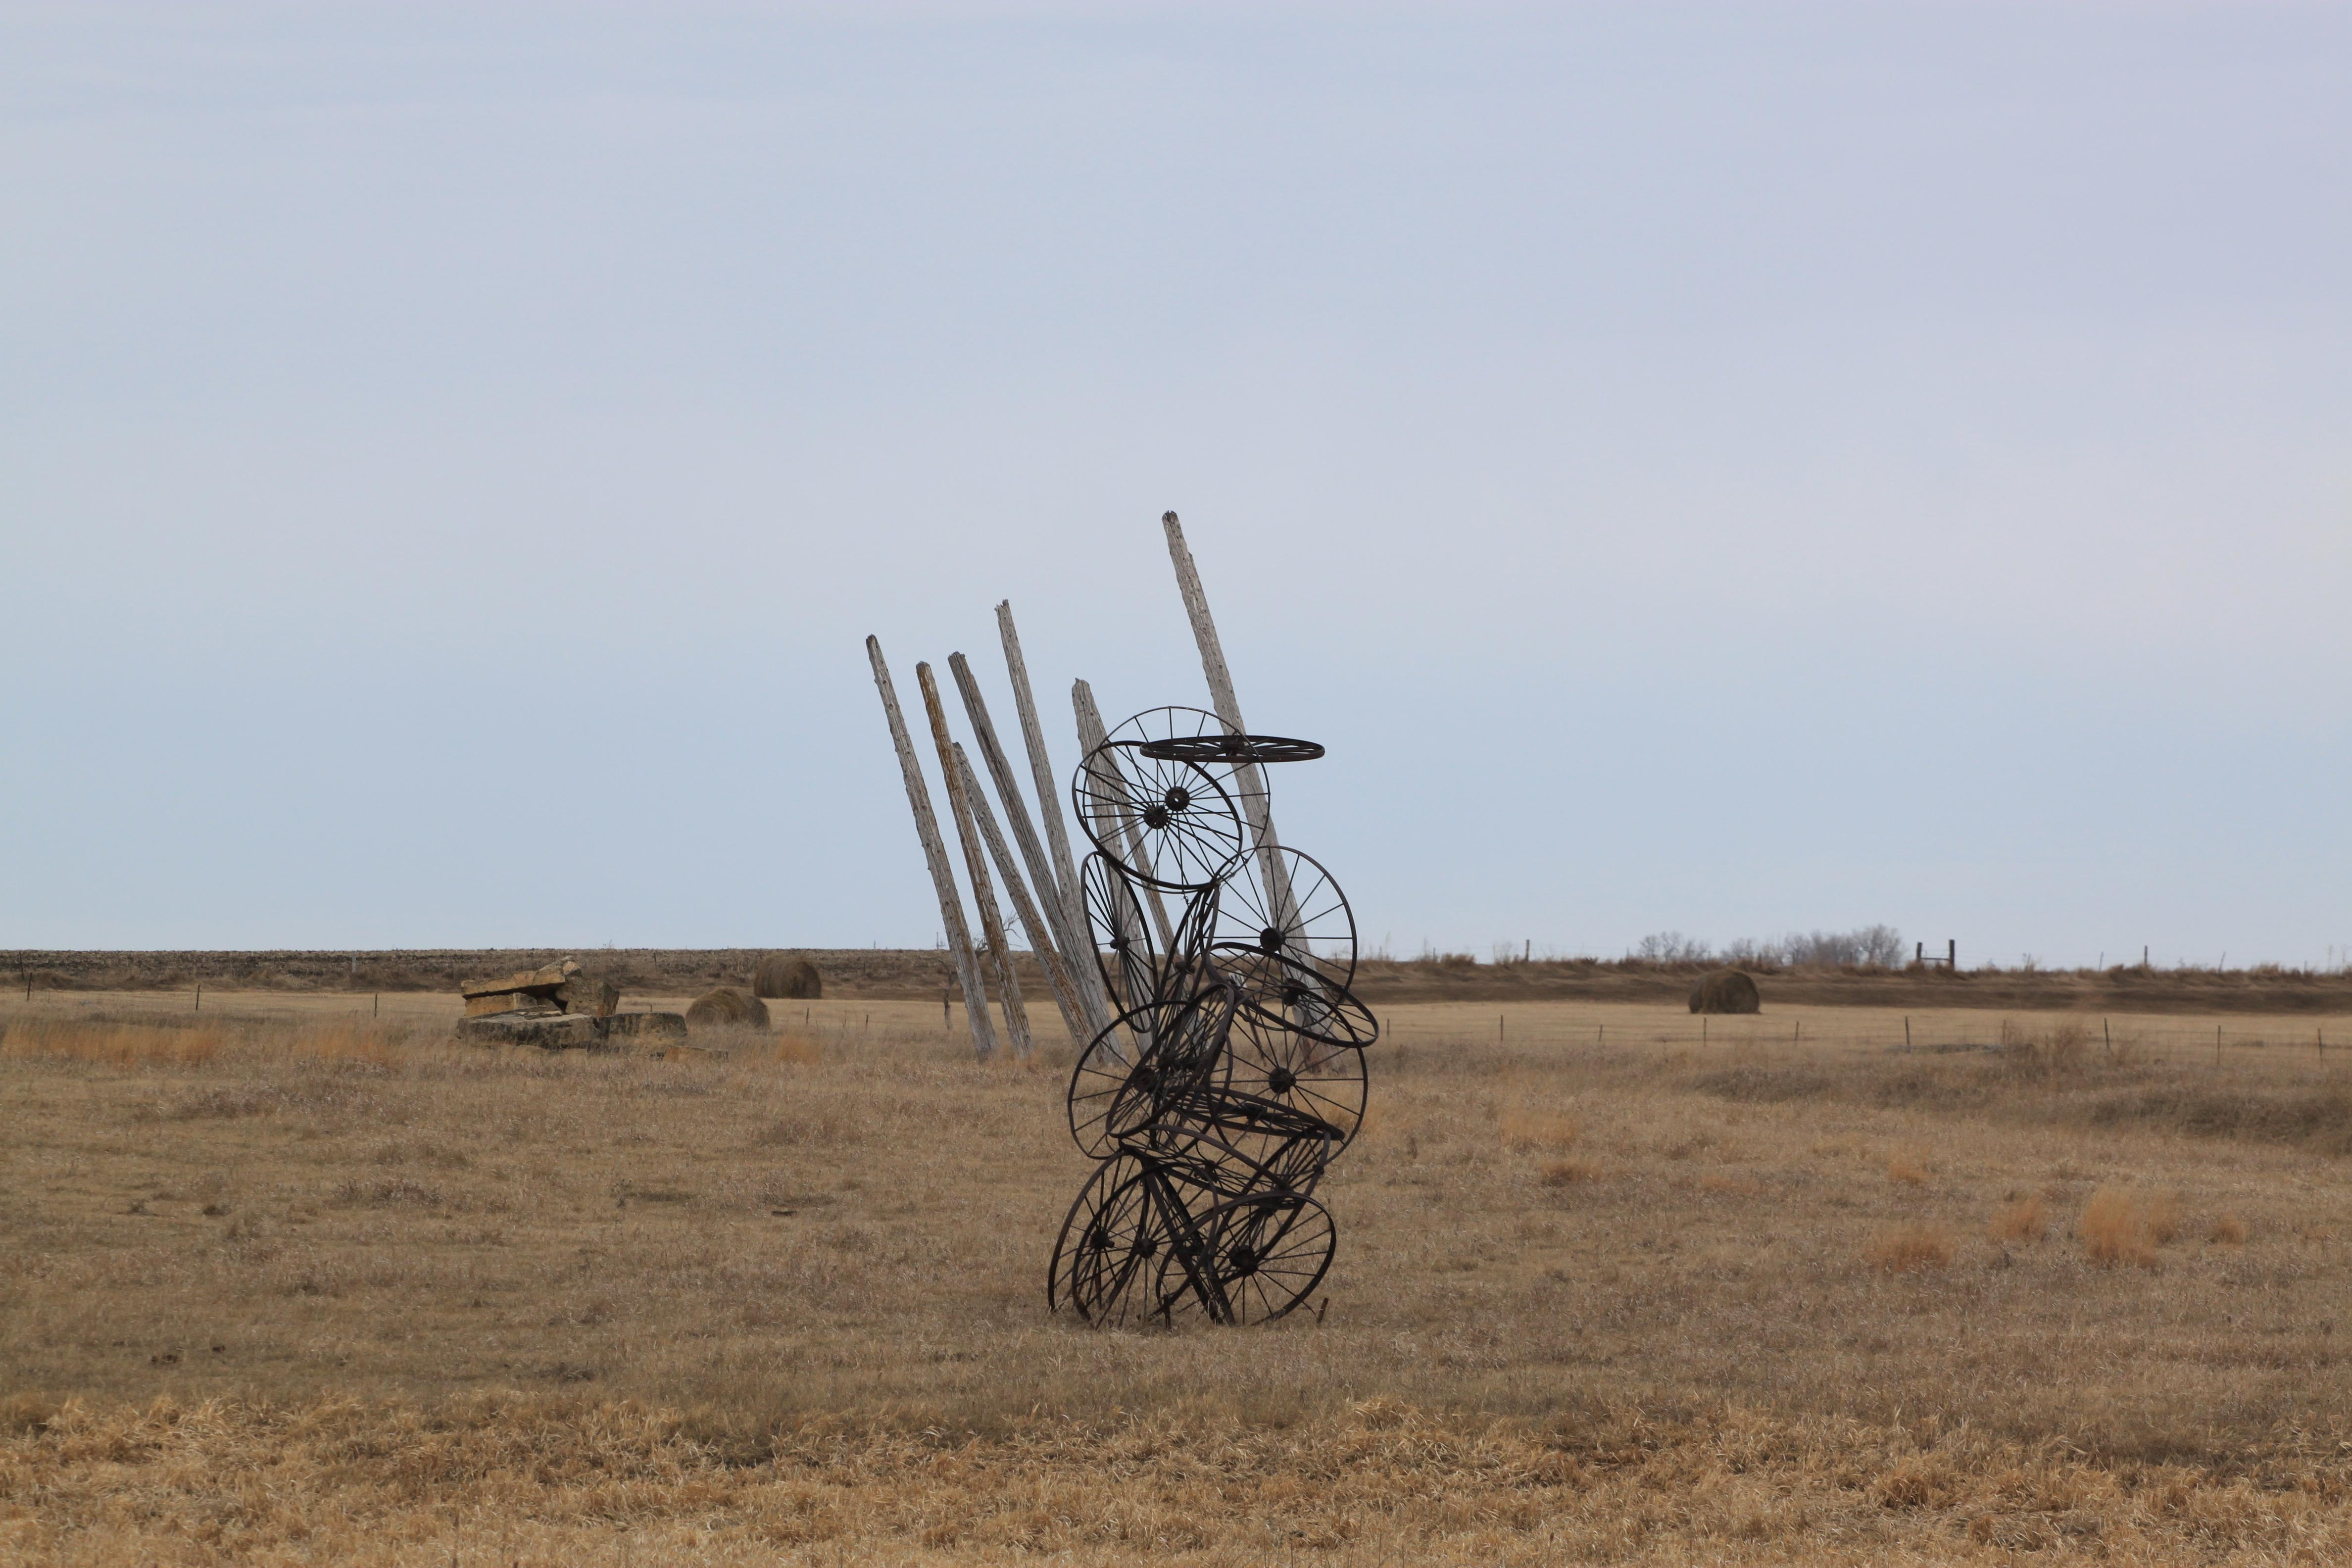 Image - clarksculpturepark16.JPG